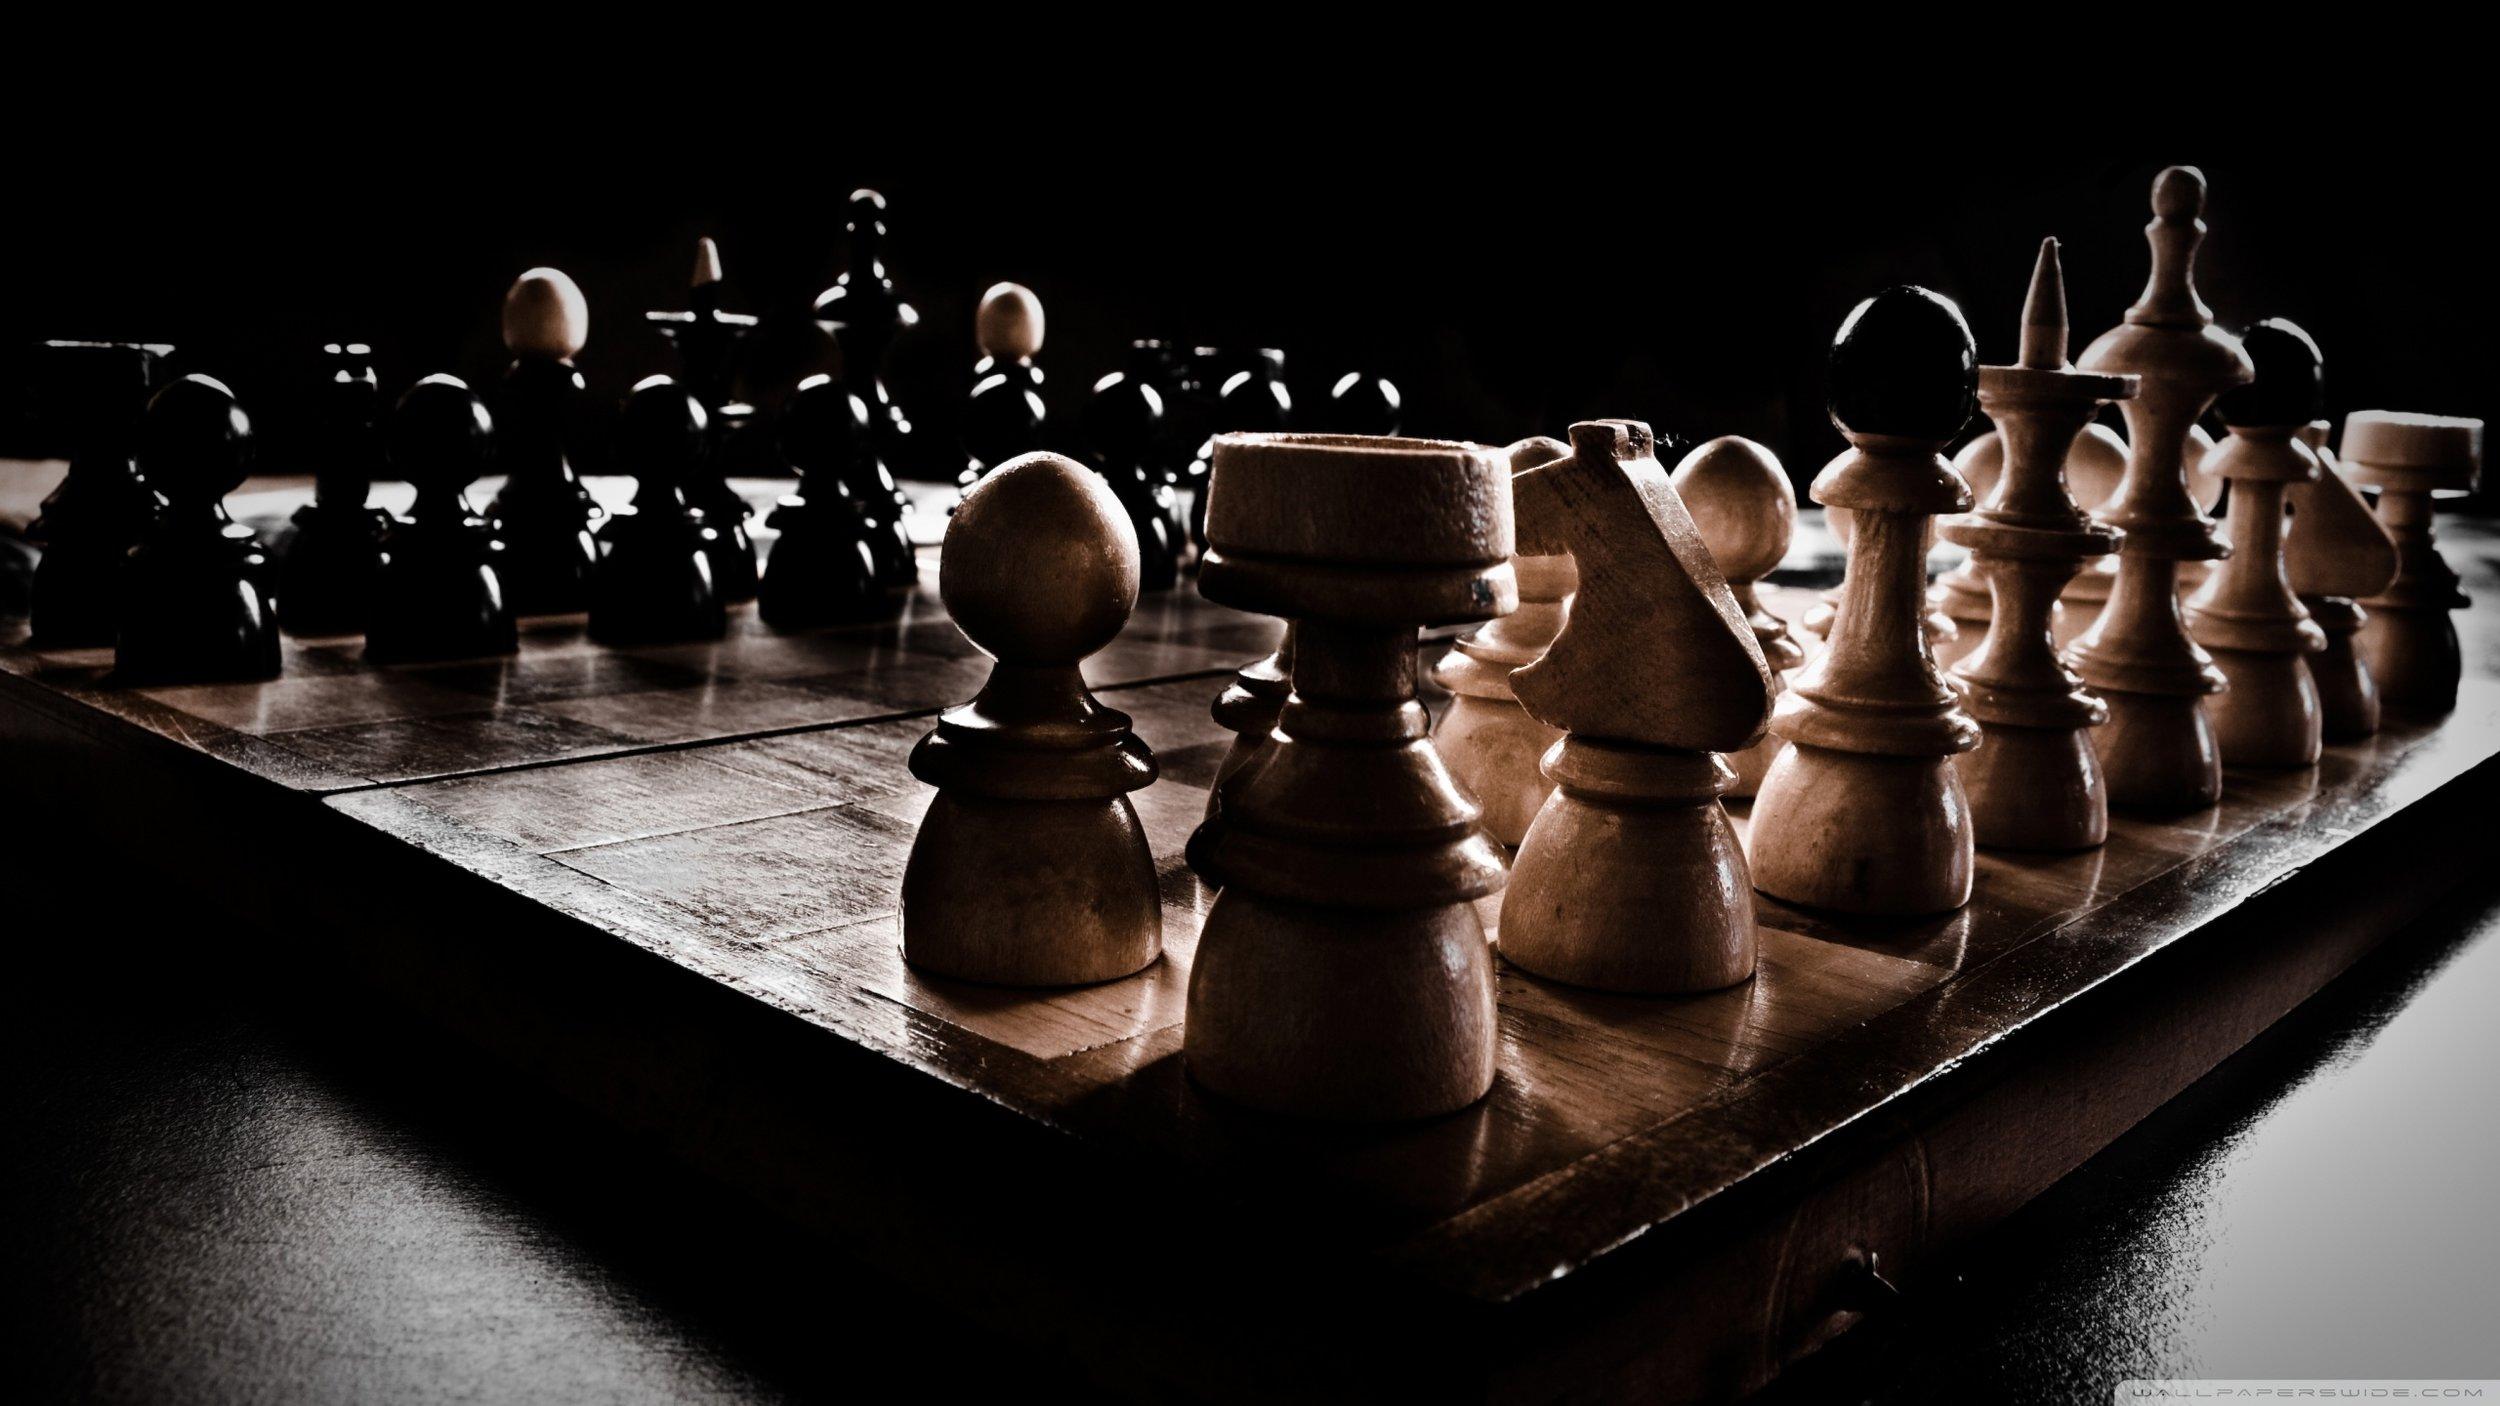 chess_board-wallpaper-2560x1440.jpg